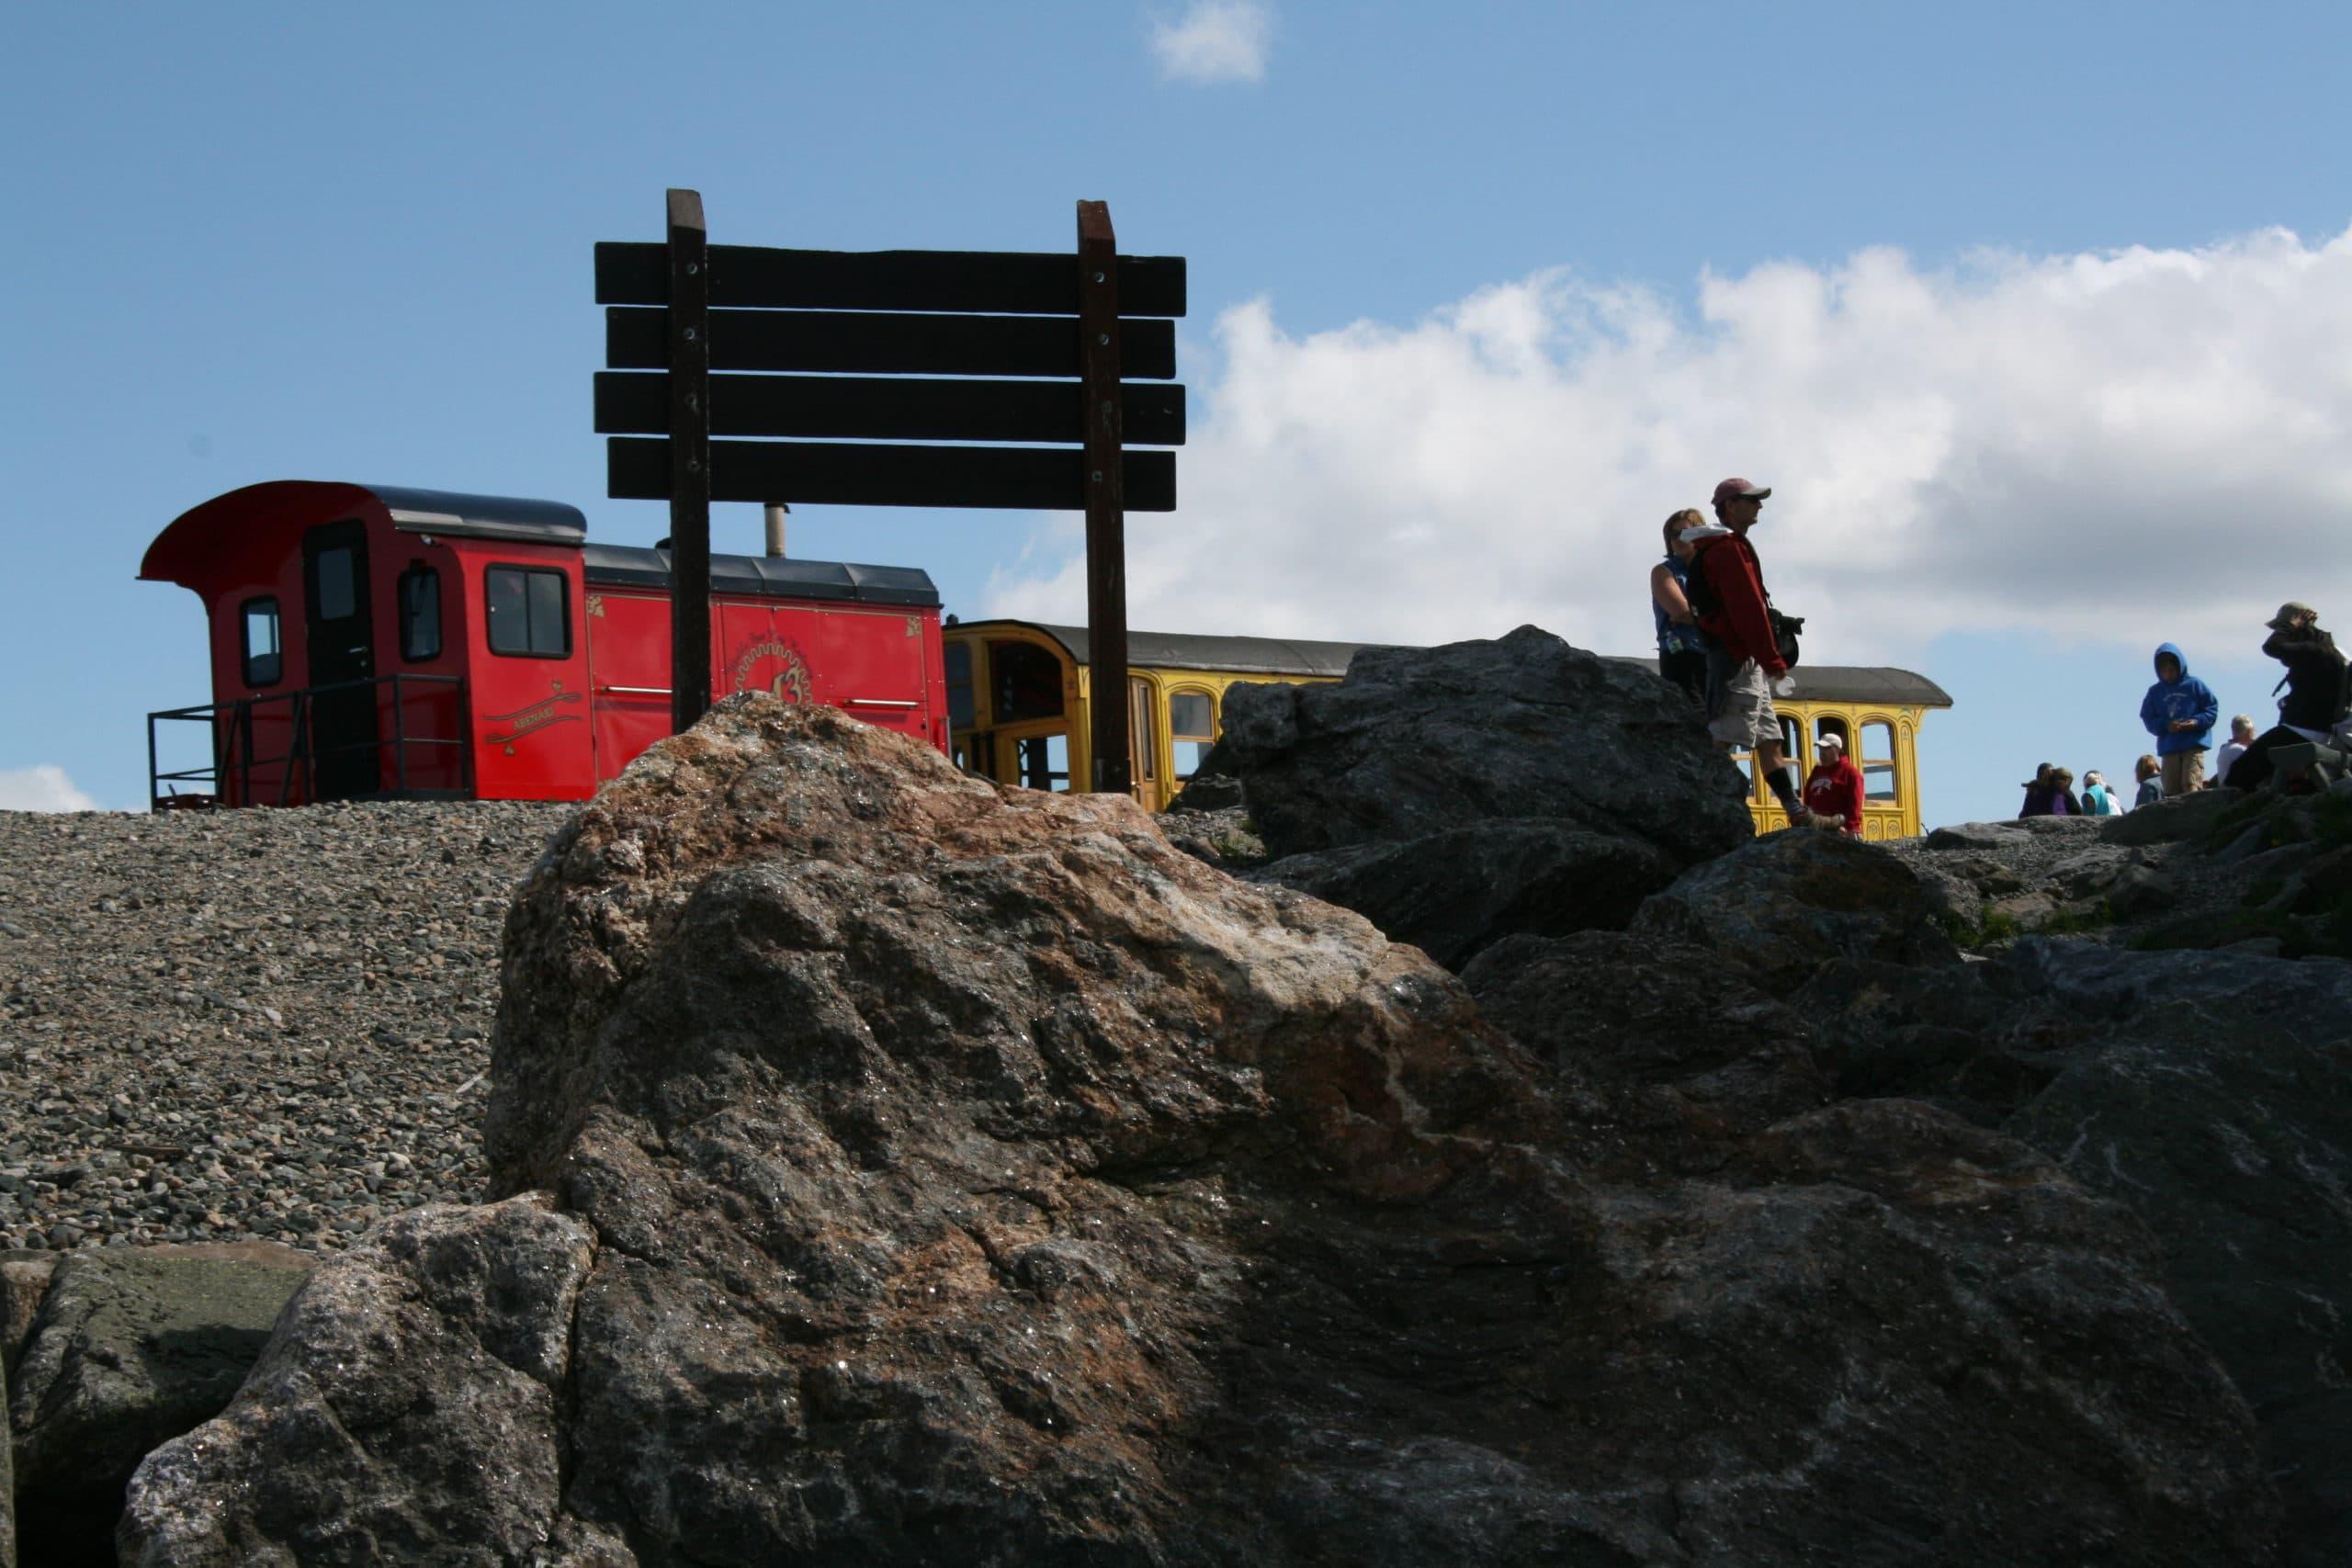 Adventures on the Cog Railway! Explore New Hampshire's Mt. Washington 3